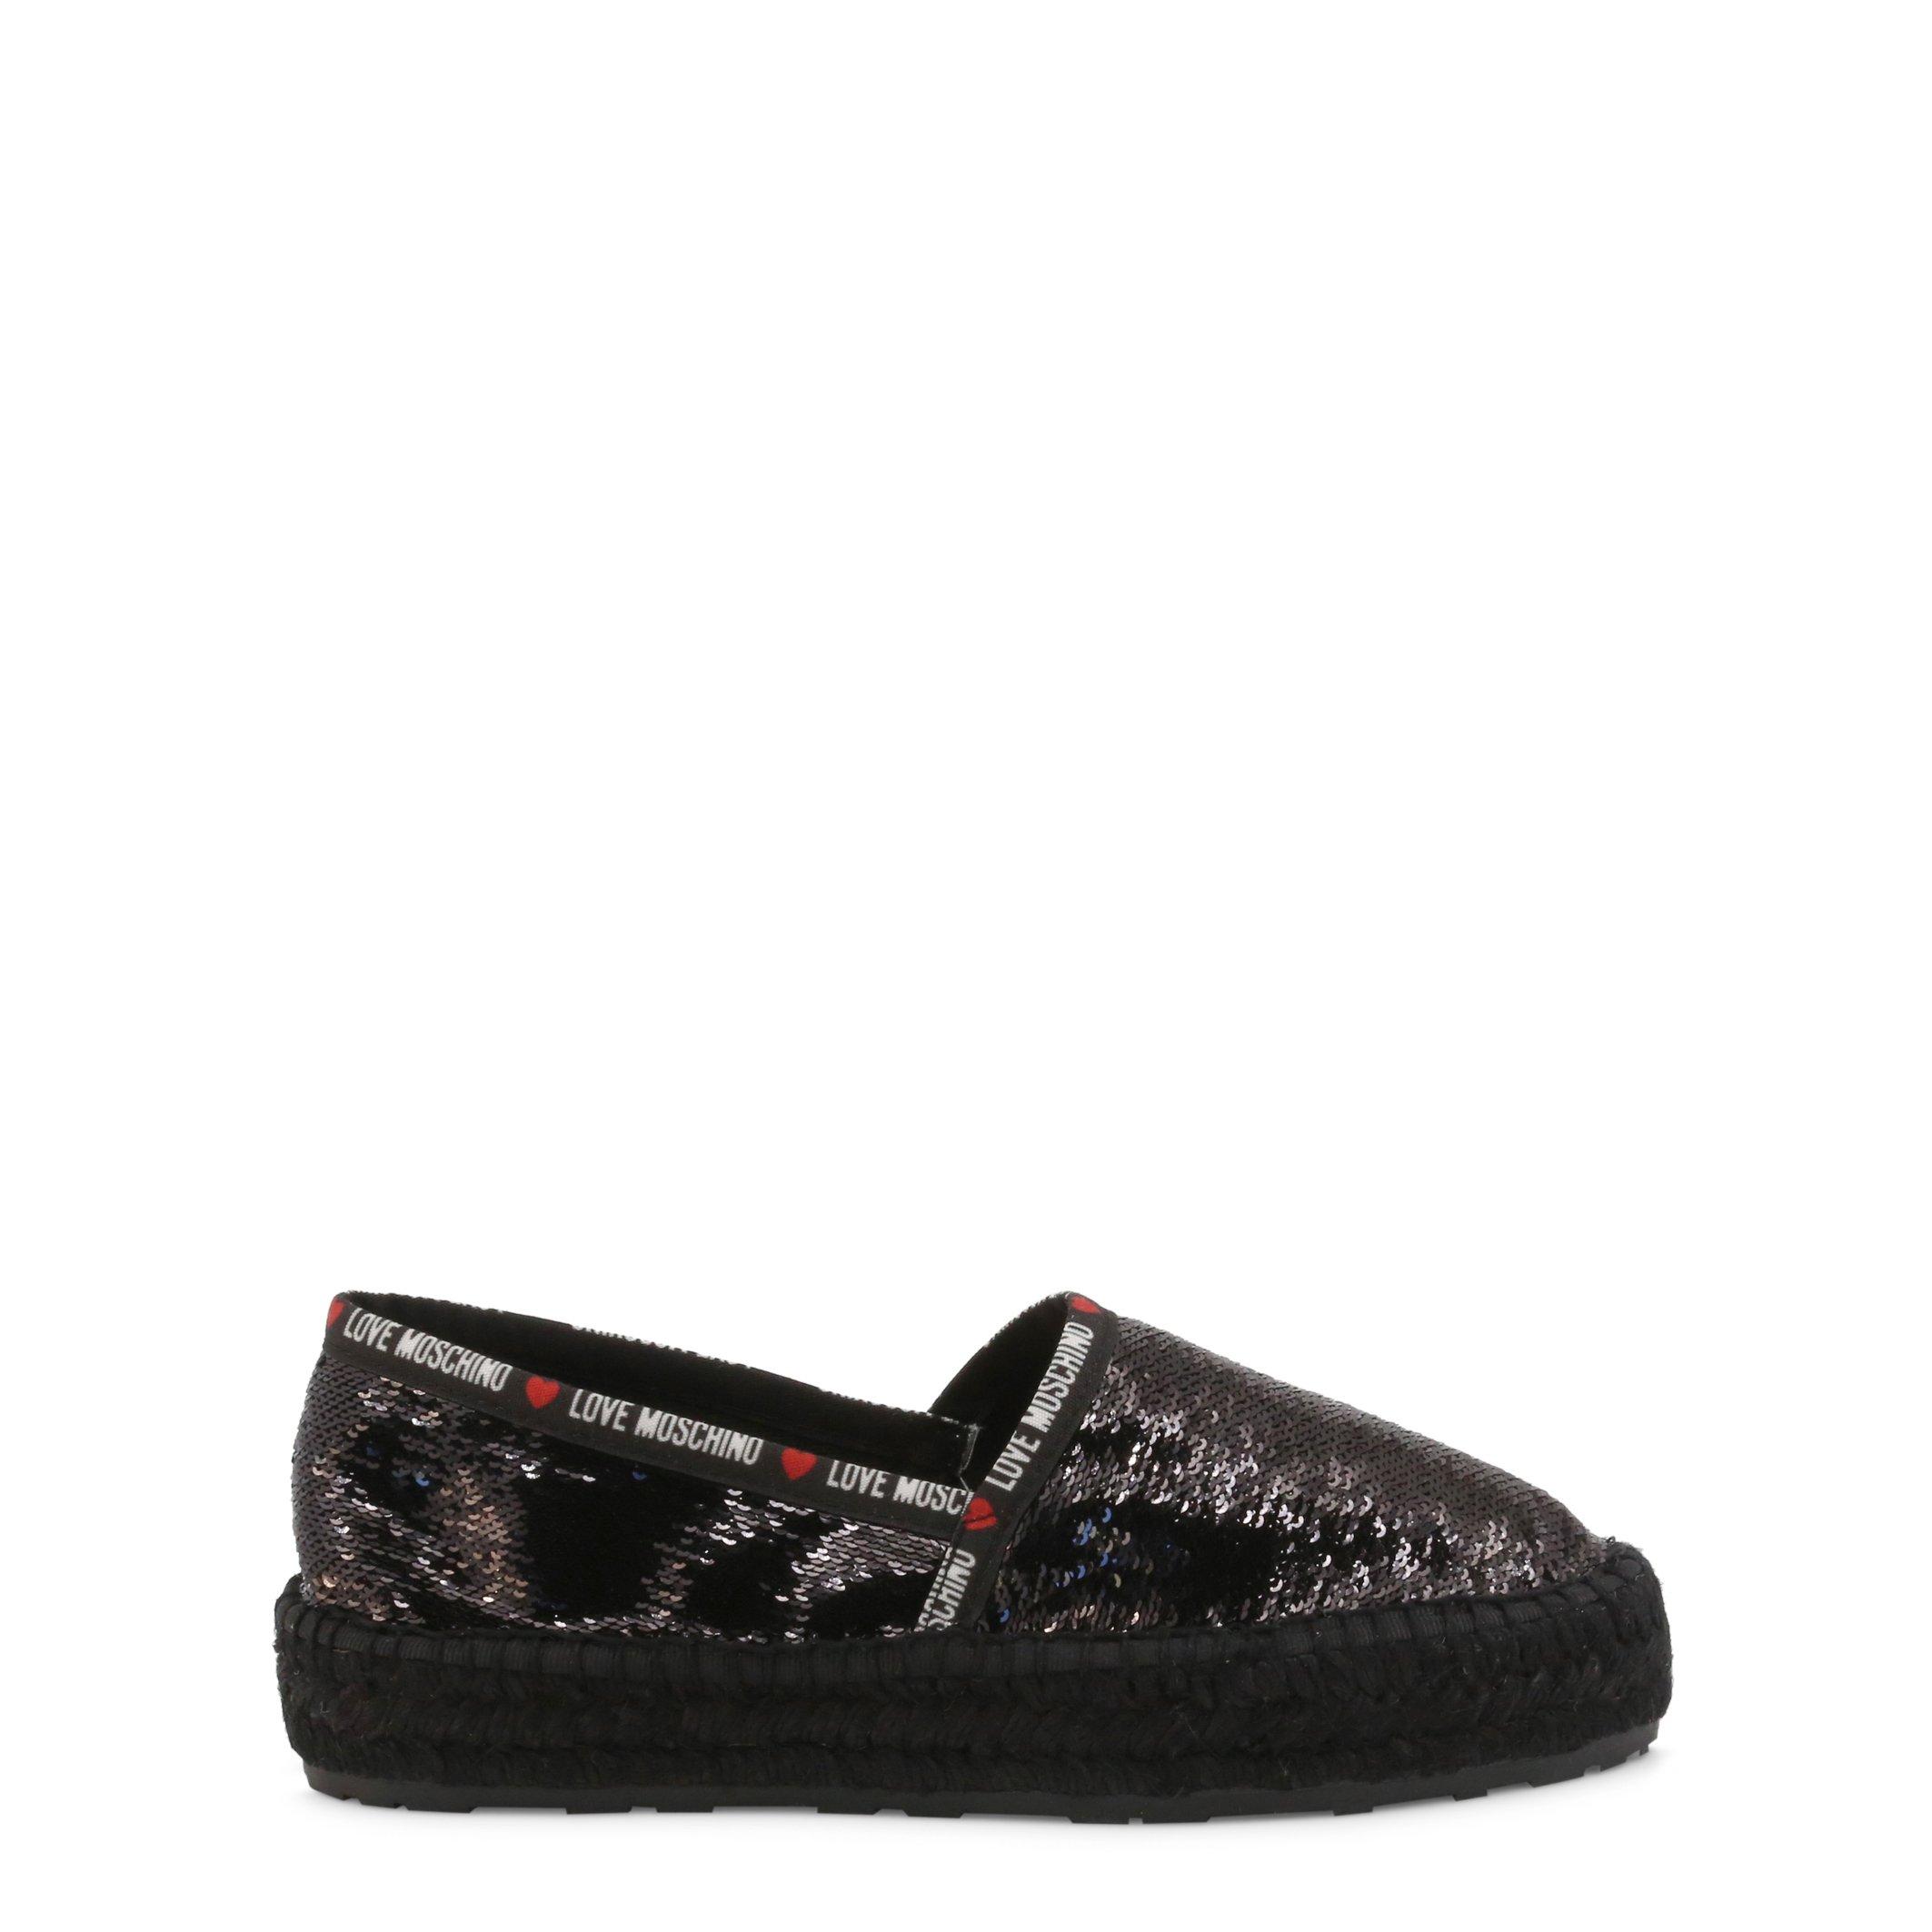 Love Moschino Women's Slip on Shoe Various Colours JA10373G0CJL0 - black EU 35